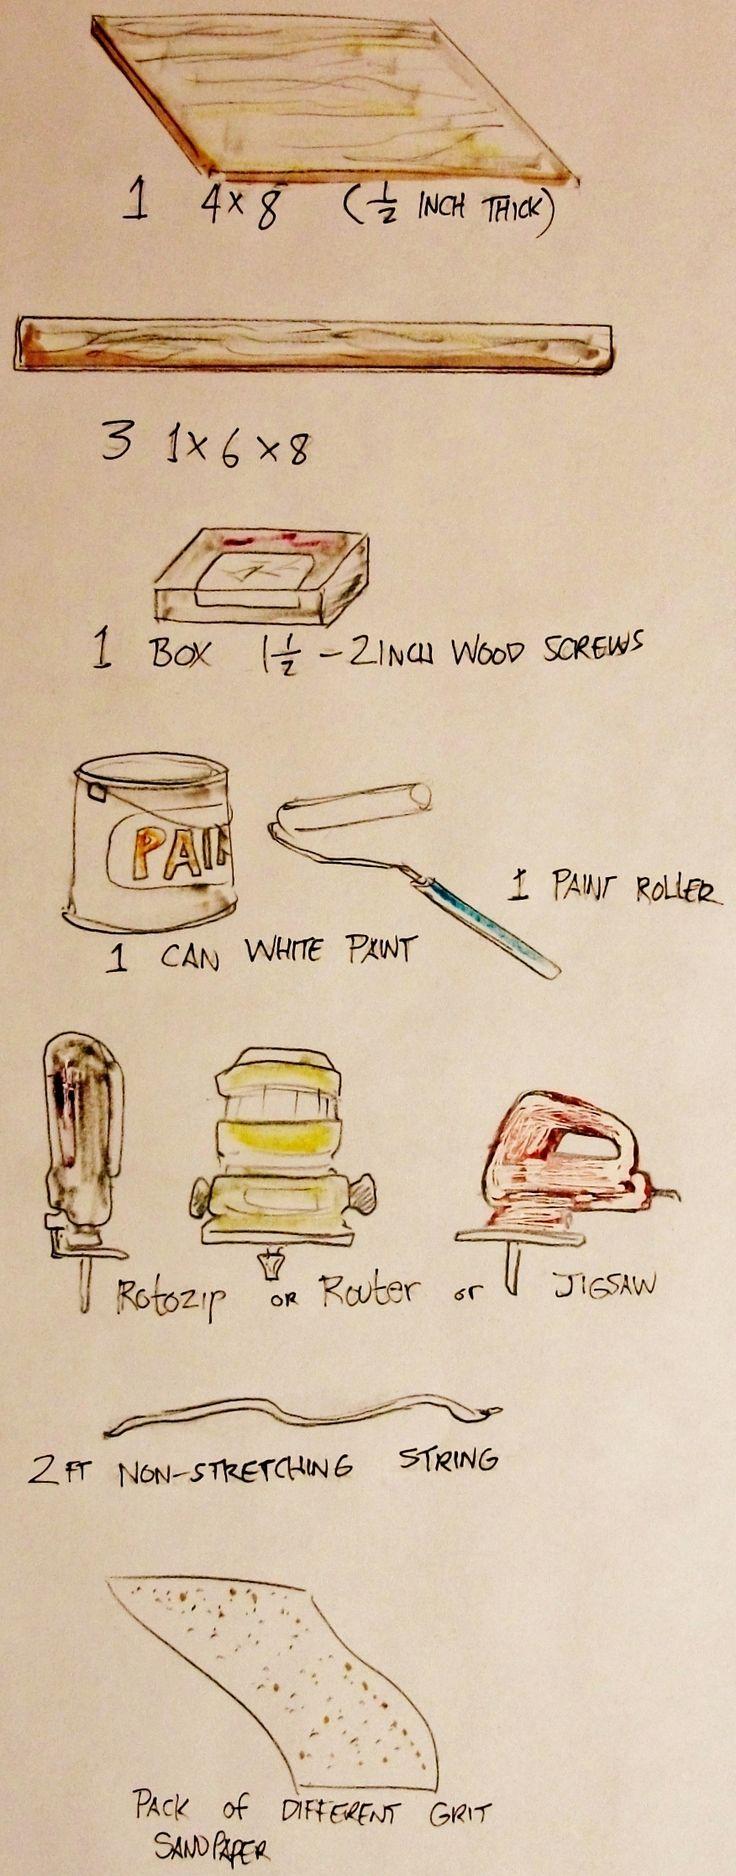 17 beste ideeën over Lazy Susan Shoe Rack op Pinterest - Schoenenrek ...